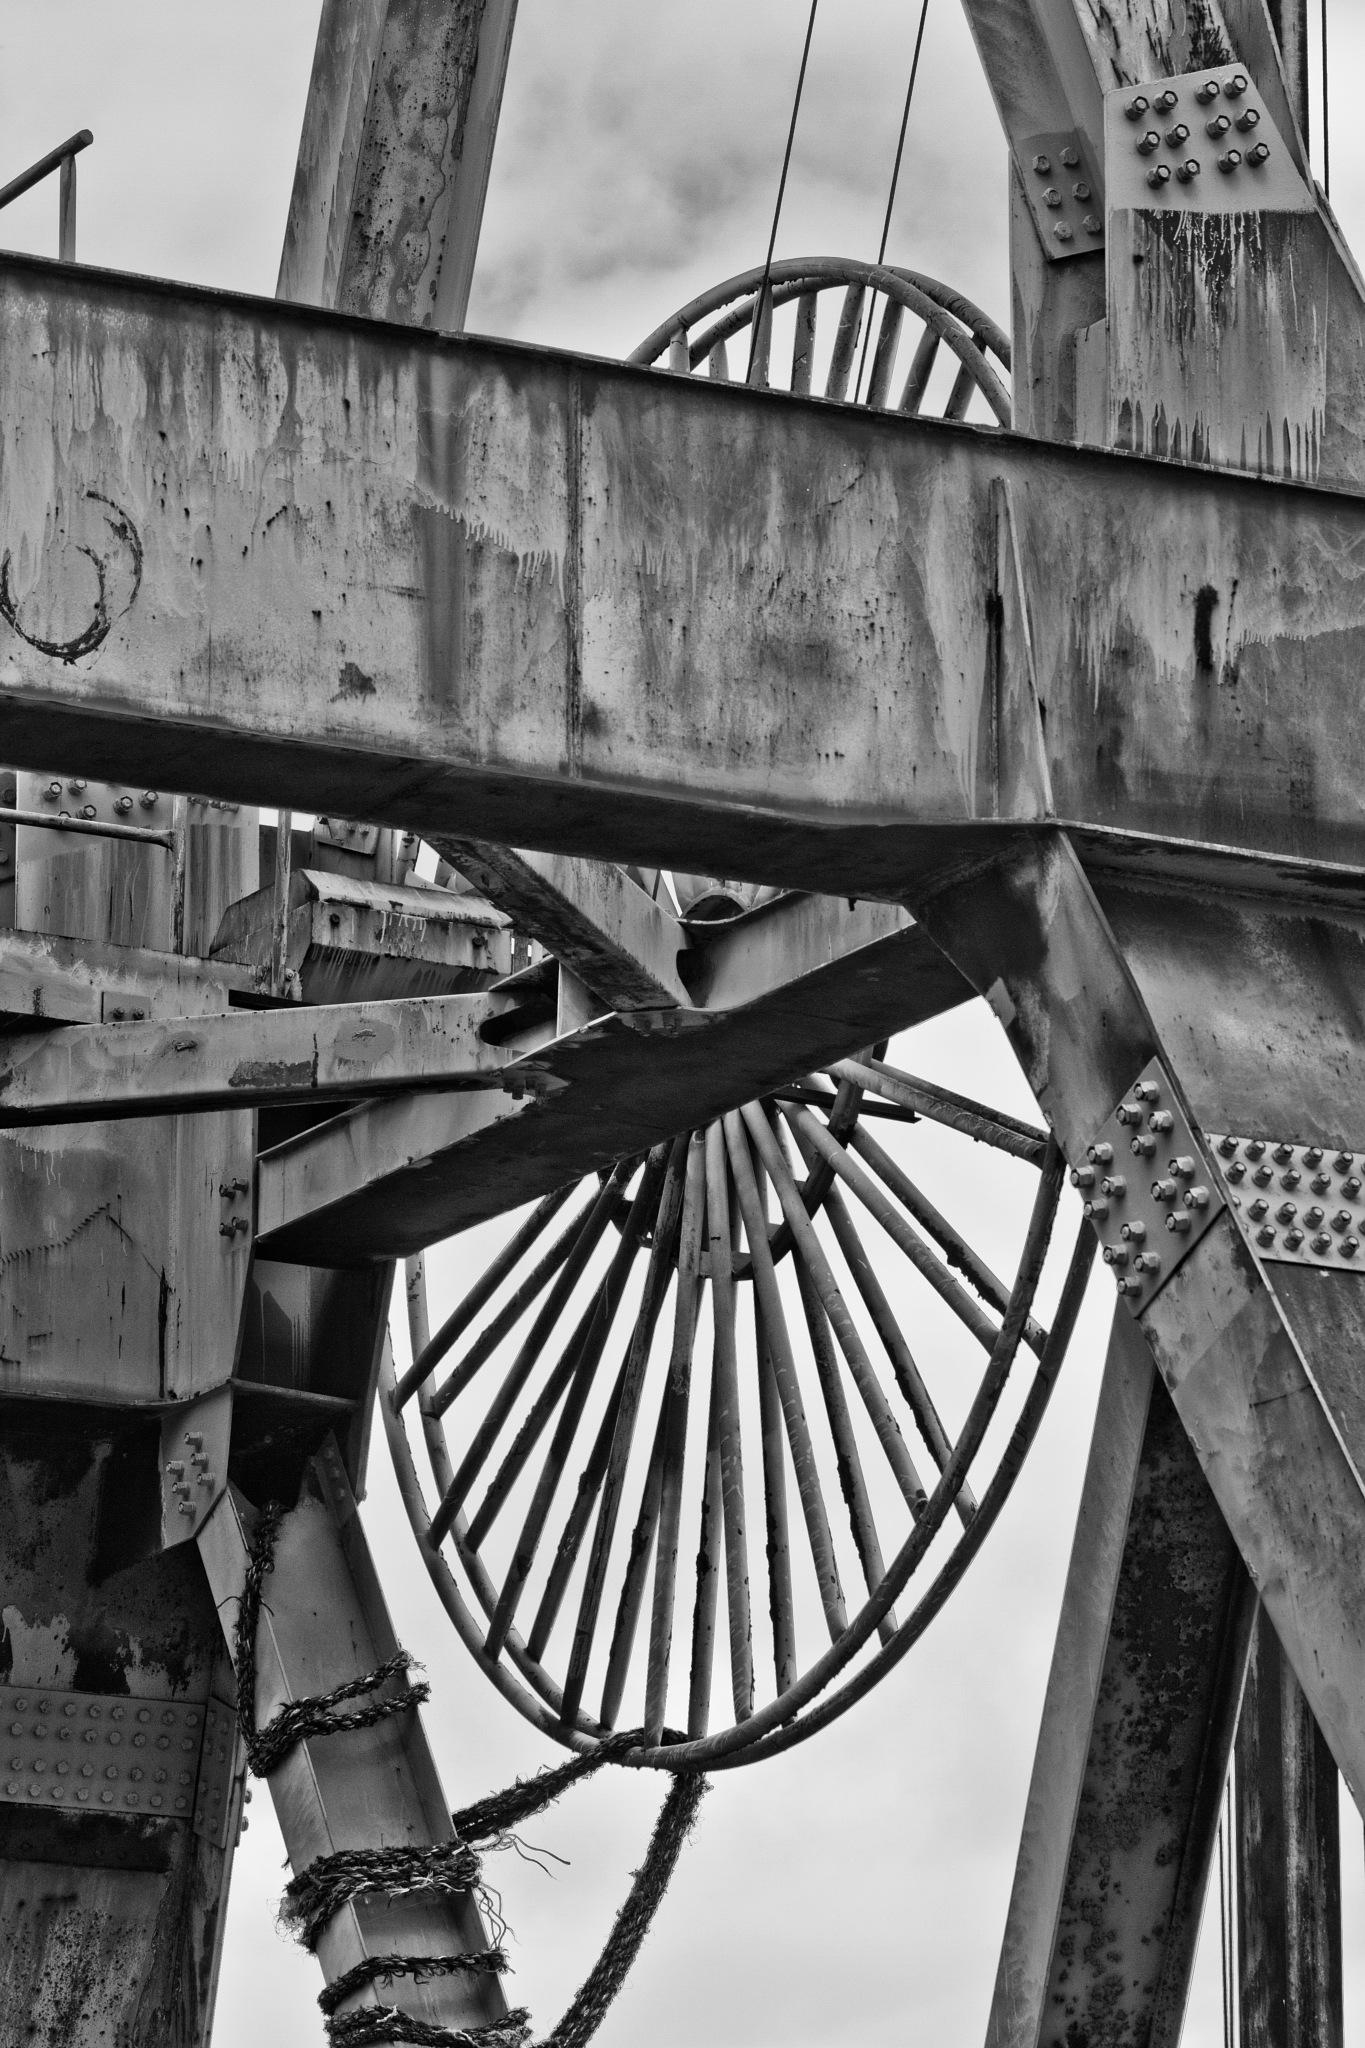 Old Crane detail by Antje Braun